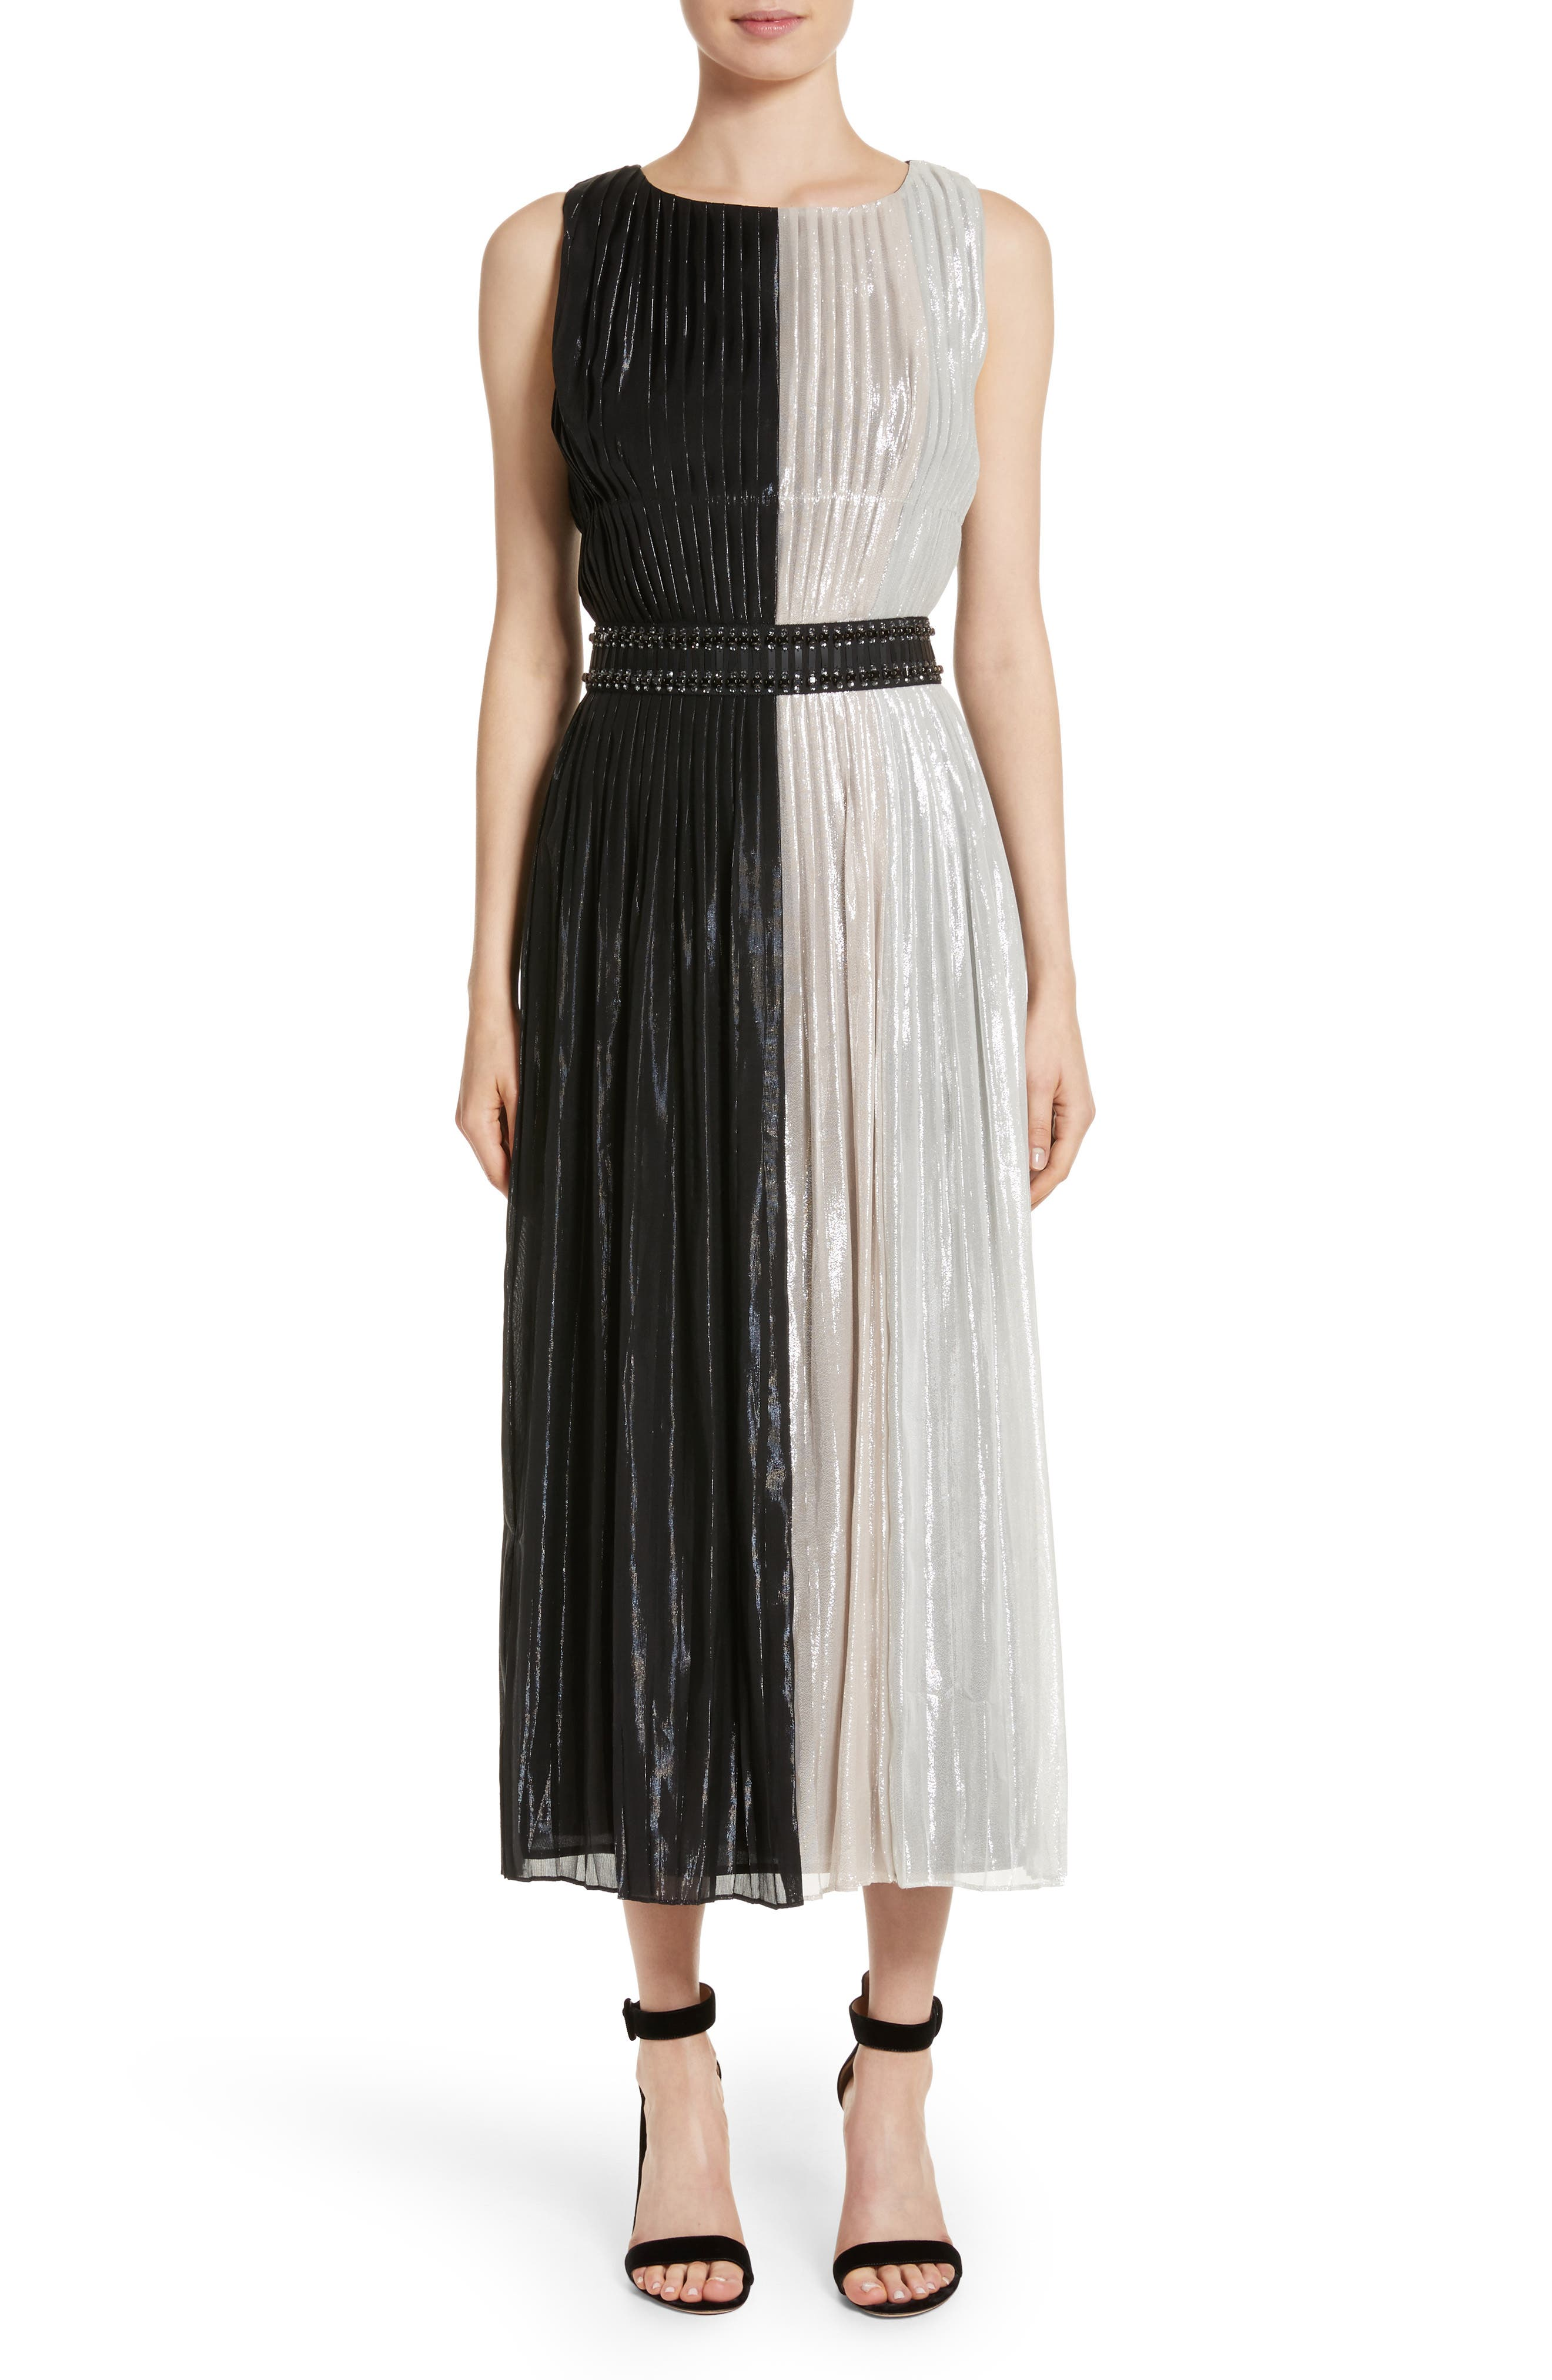 Alternate Image 1 Selected - St. John Collection Pleated Chiffon Midi Dress